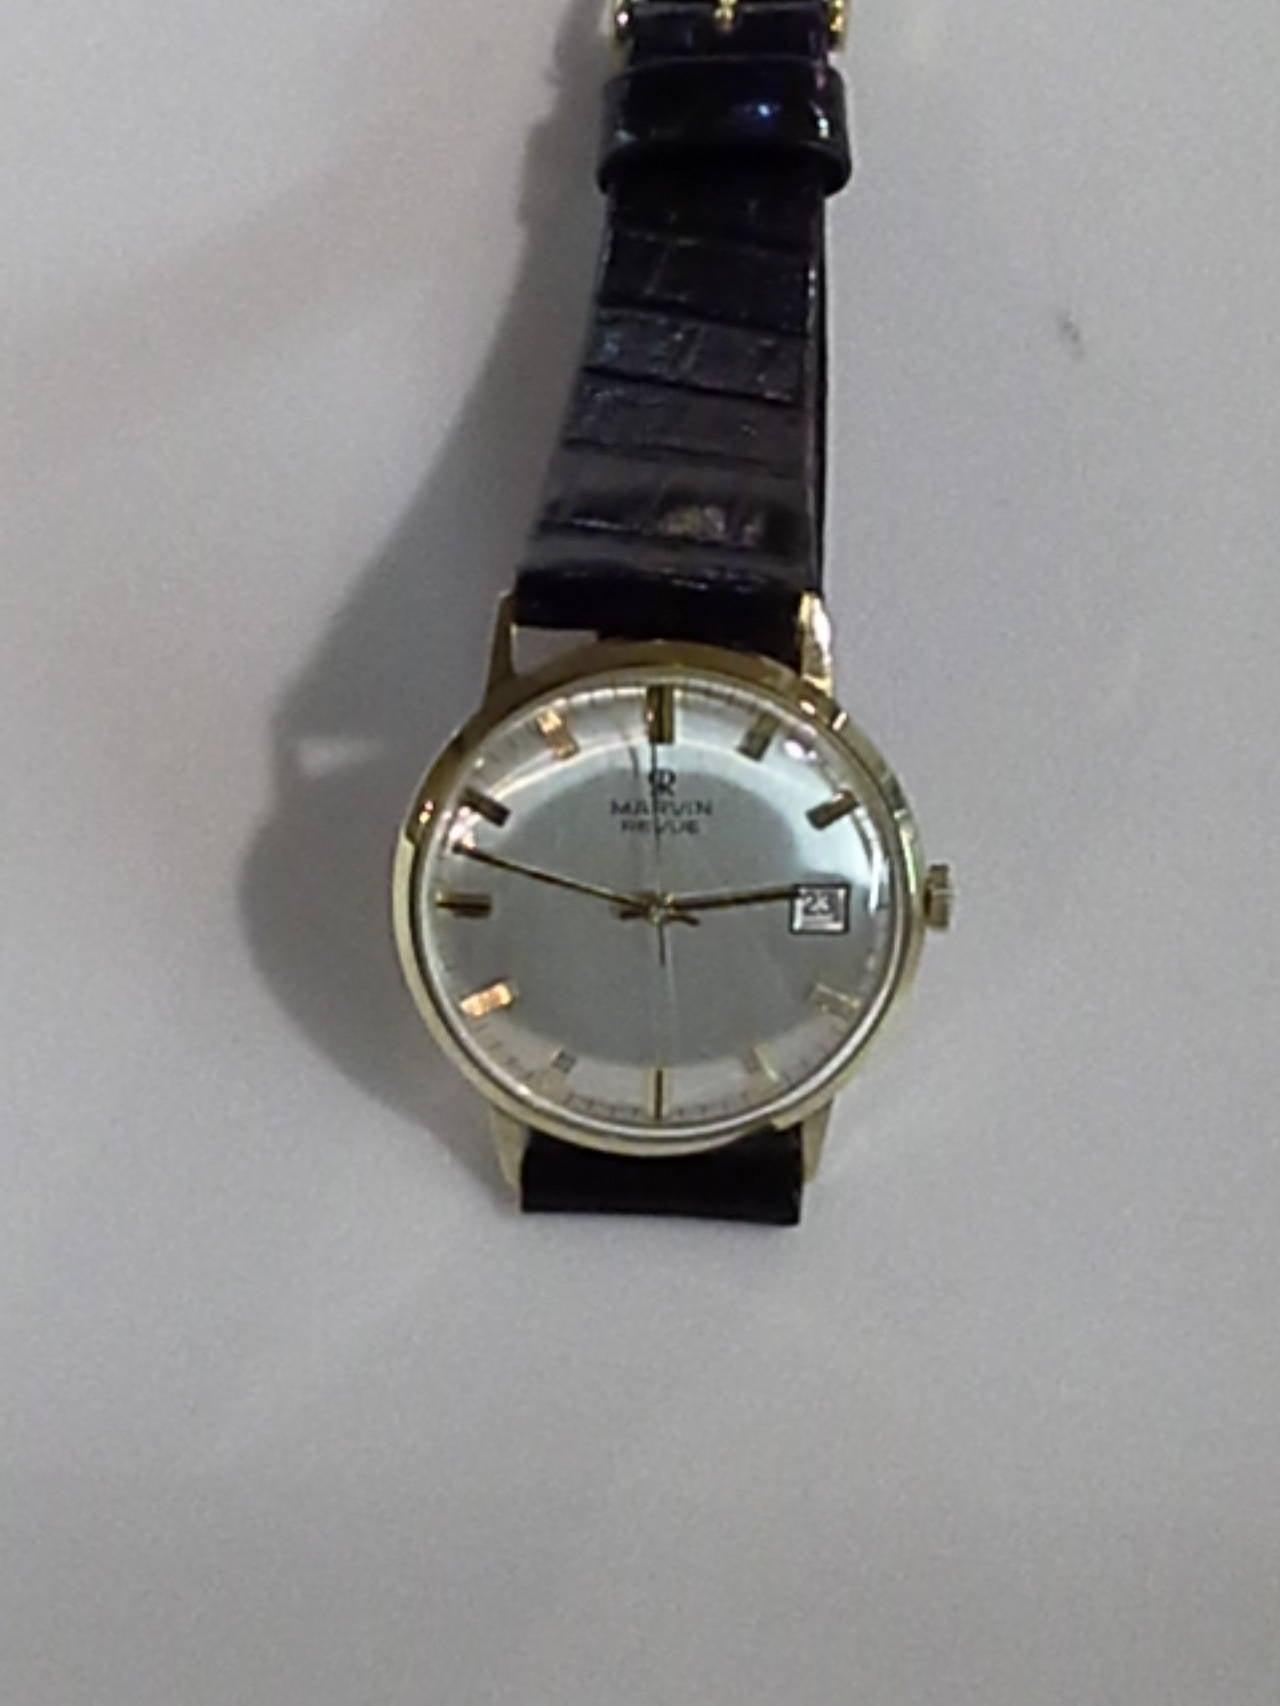 Modern Marvin Revue Day or Date Gold Wristwatch with Original Bracelet in Original Box